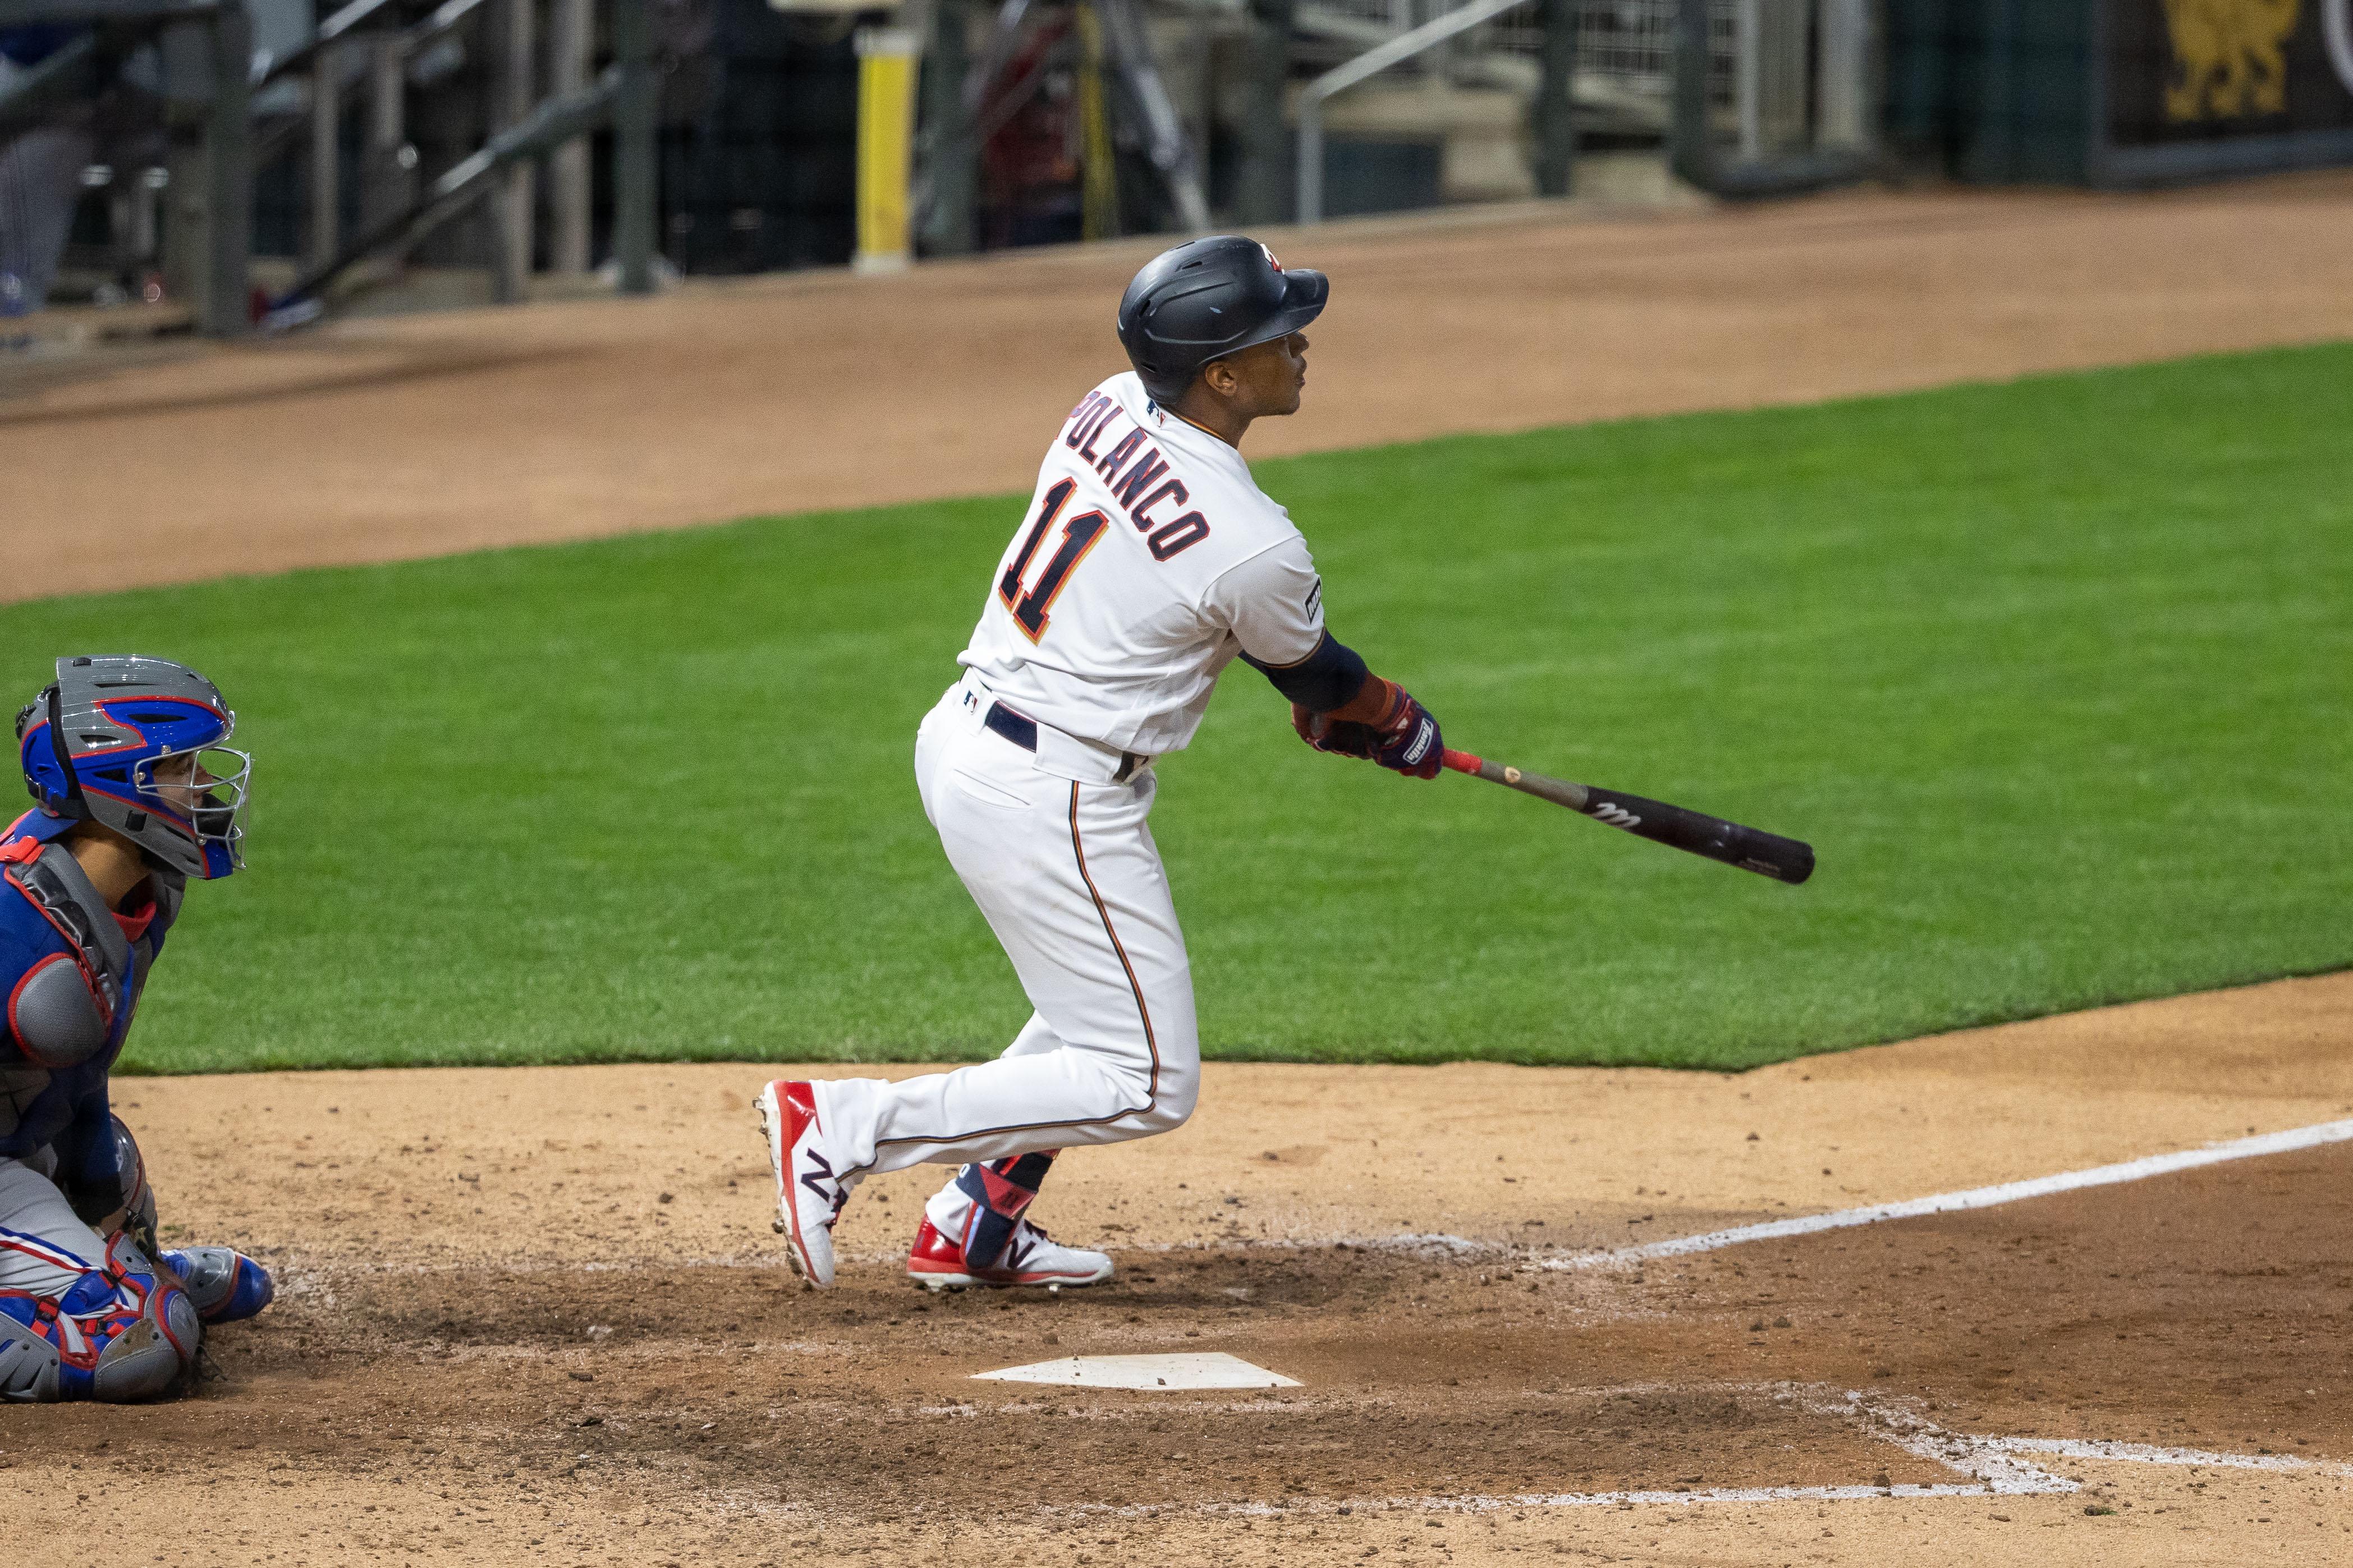 May 3, 2021; Minneapolis, Minnesota, USA; Minnesota Twins second baseman Jorge Polanco (11) hits a RBI triple during the sixth inning against the Texas Rangers at Target Field. Mandatory Credit: Jordan Johnson-USA TODAY Sports